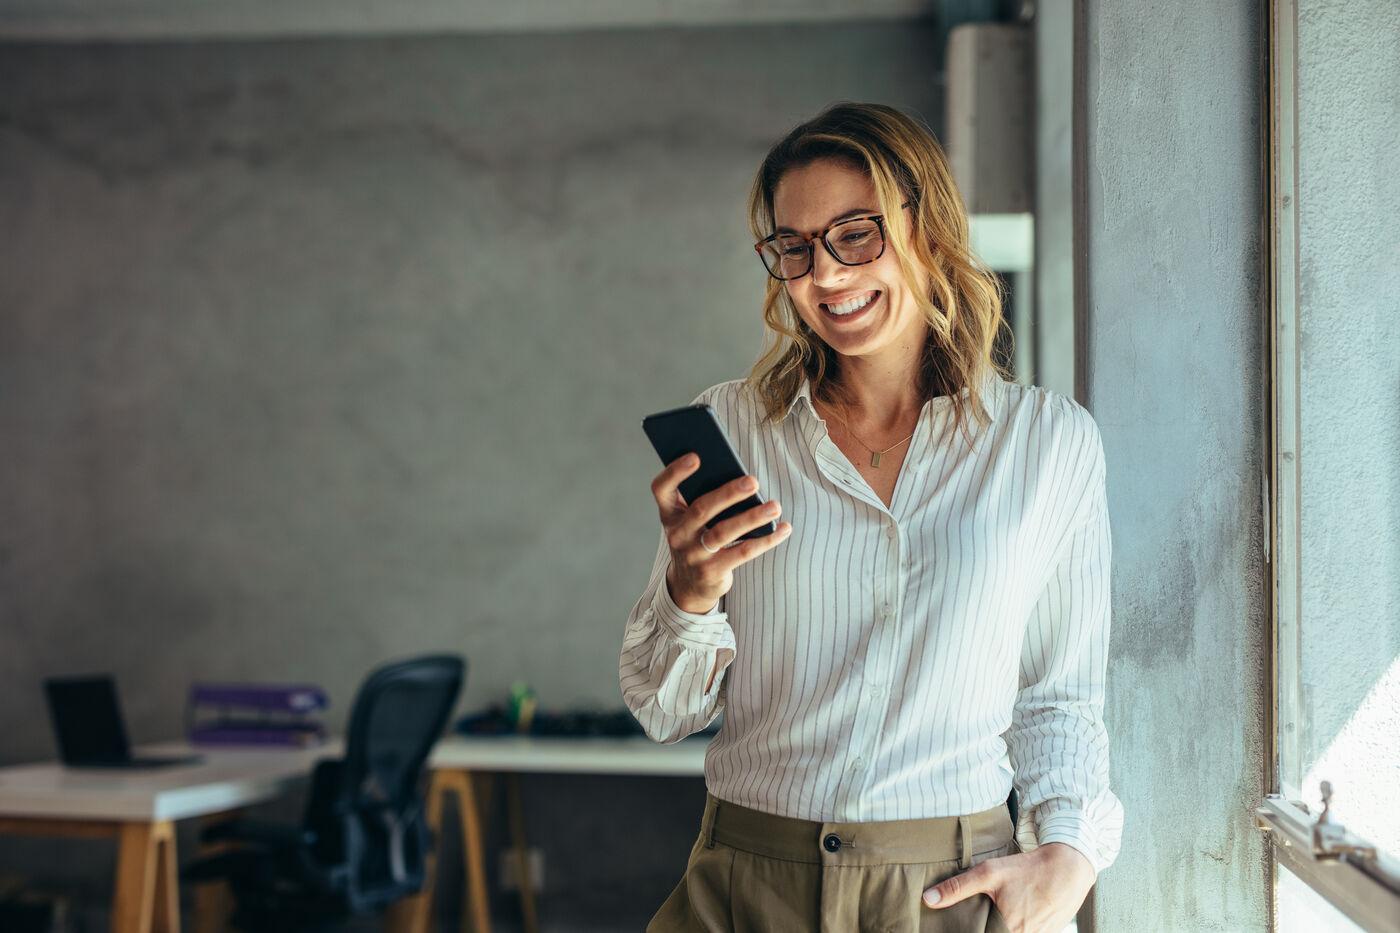 Werkstudent/ Praktikant Unterstützung der Geschäftsführung (m/w/d) - Job Heidelberg - Jobs bei Discovergy